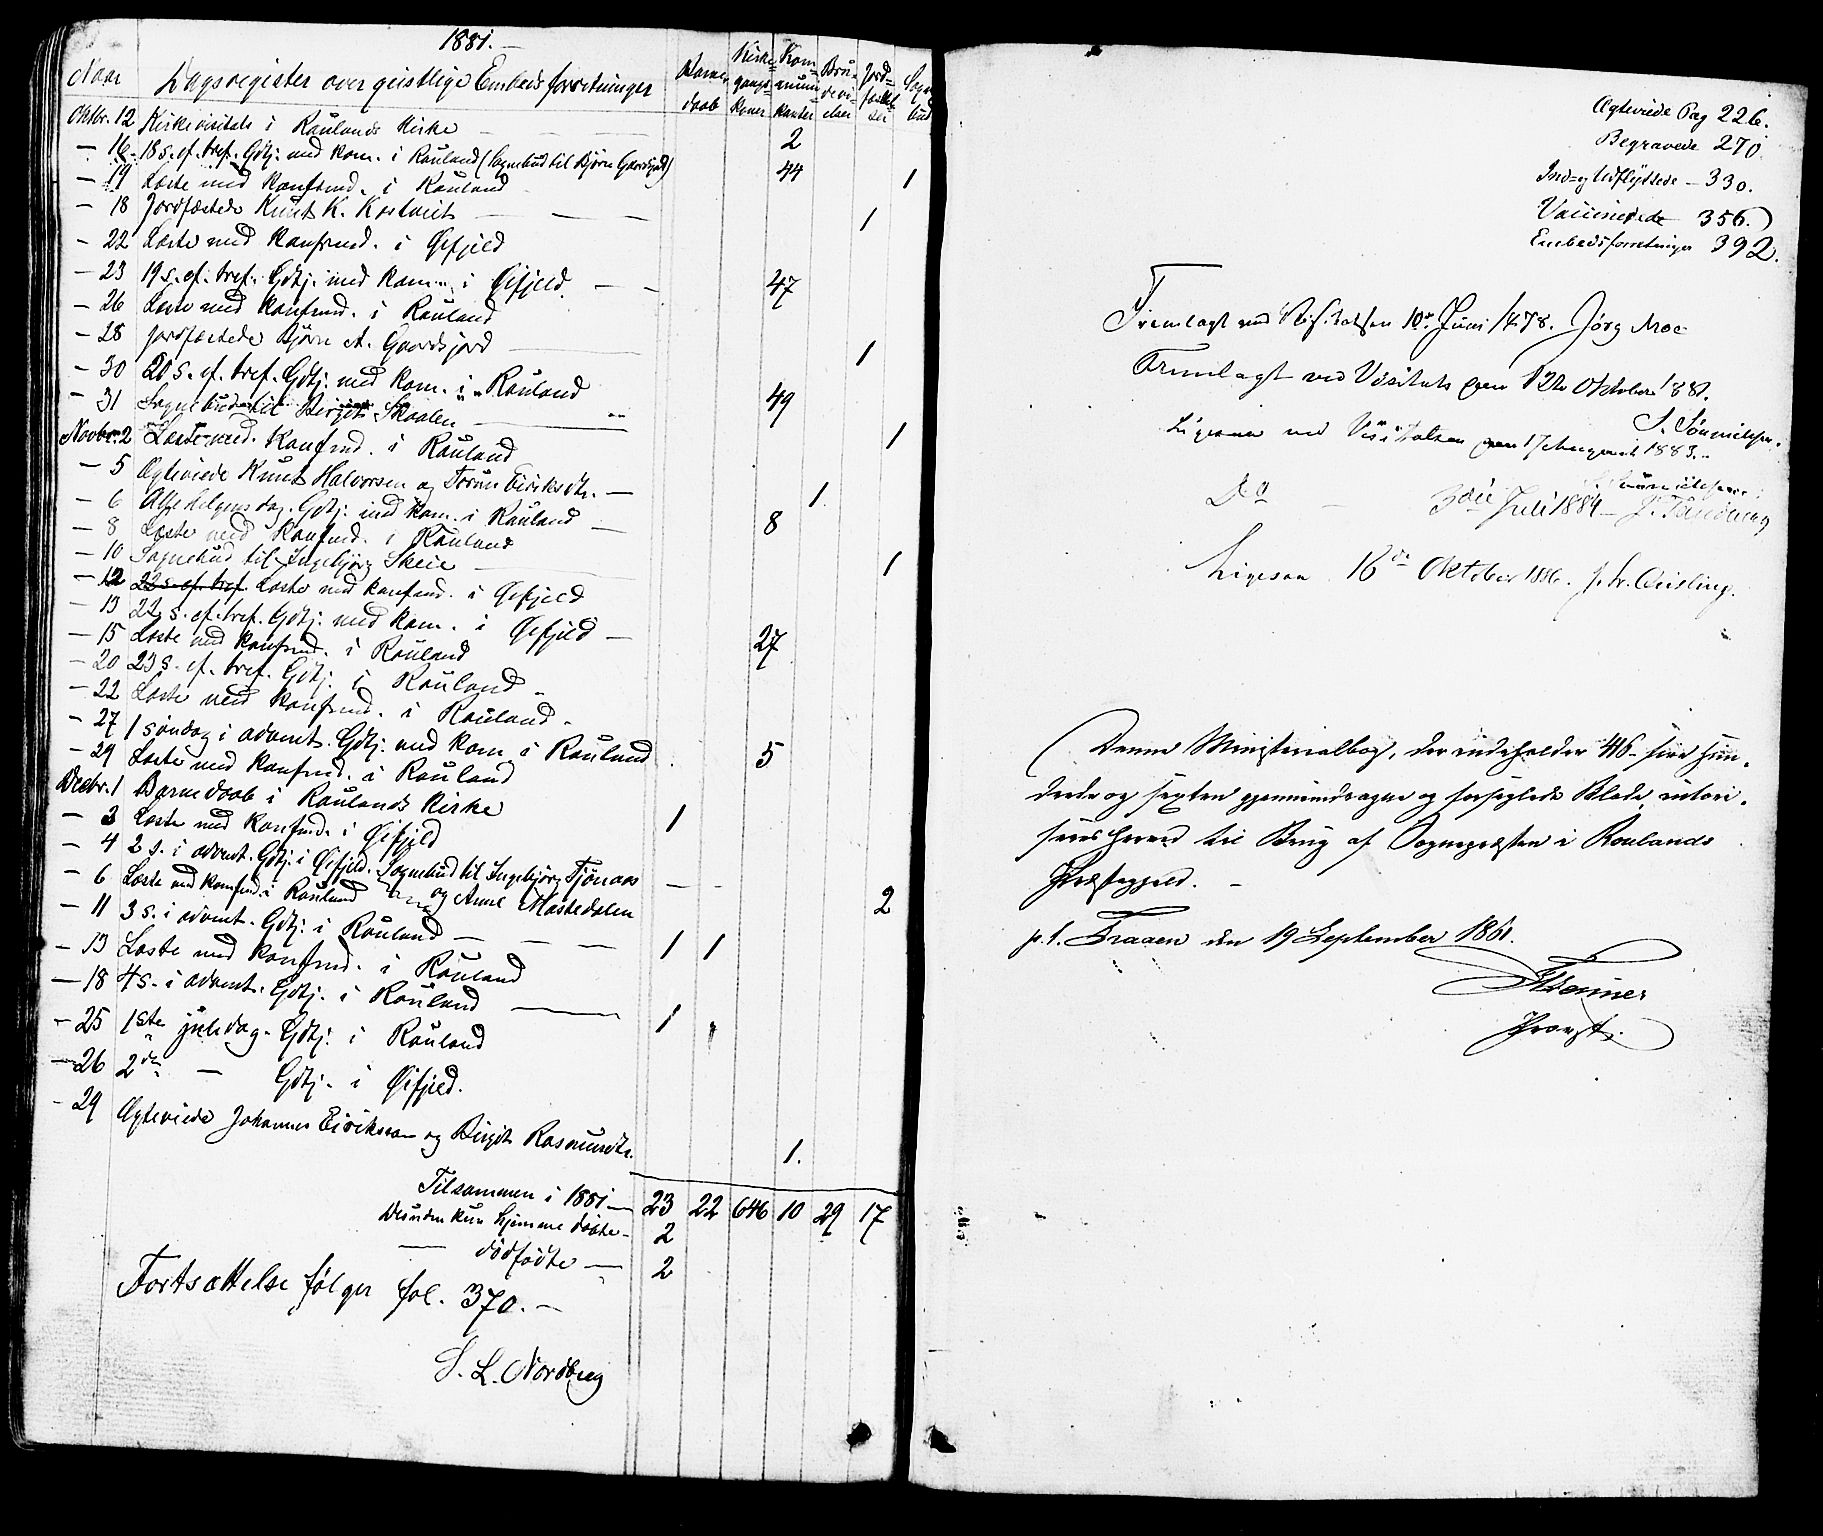 SAKO, Rauland kirkebøker, F/Fa/L0003: Ministerialbok nr. 3, 1859-1886, s. 417